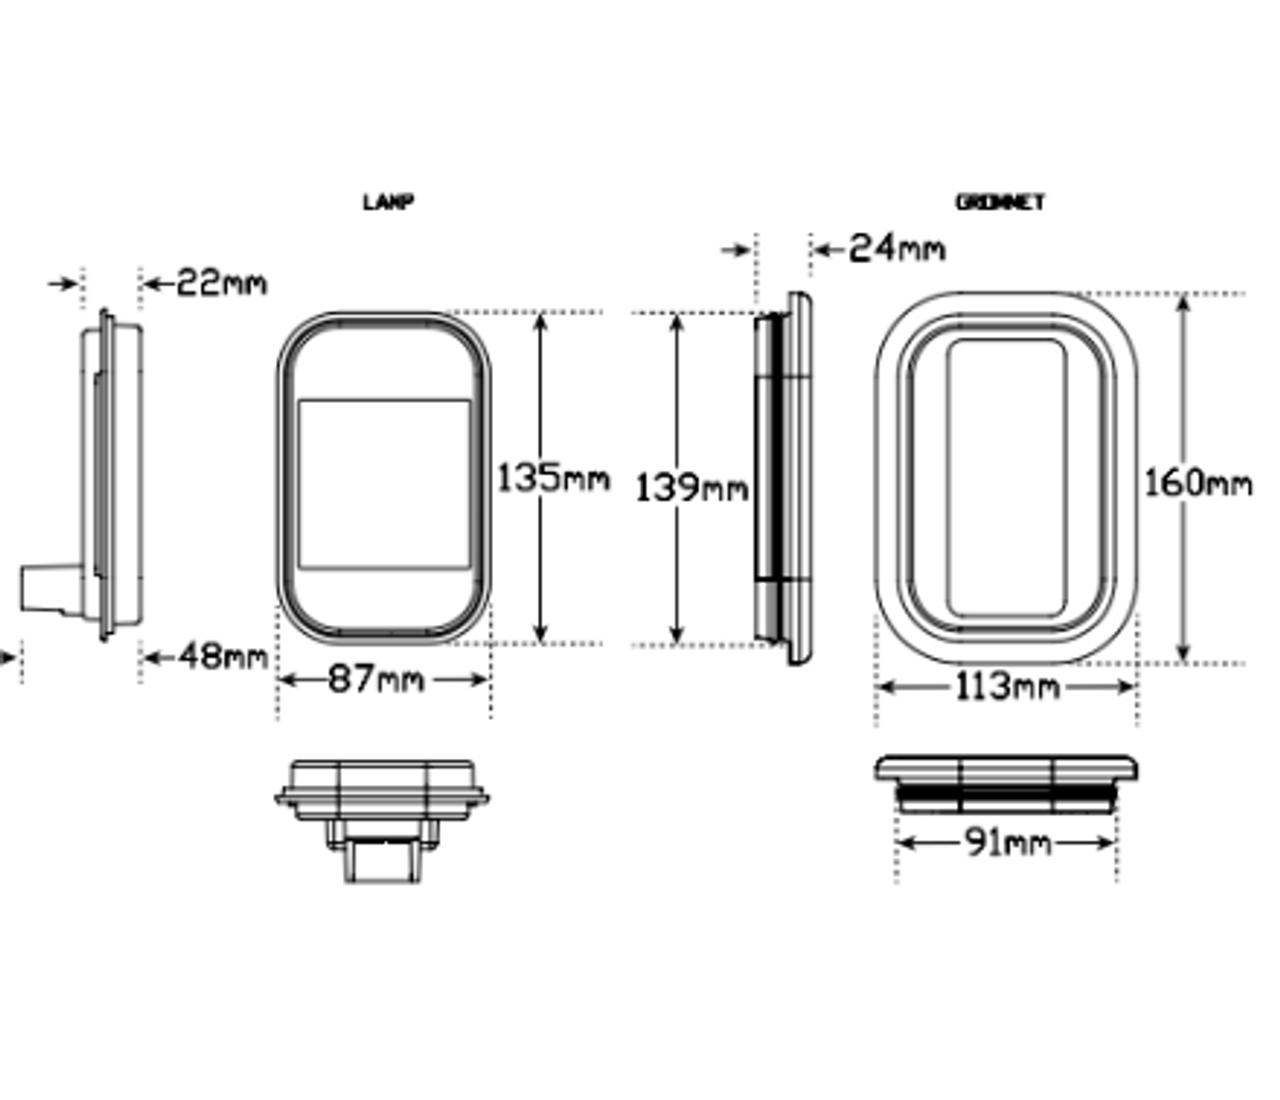 Line Drawing - 133AMG - Indicator Light with Reflector Rectangle. Multi-Volt 12v & 24v Blister Single Pack. LED Auto Lamps. Ultimate LED.